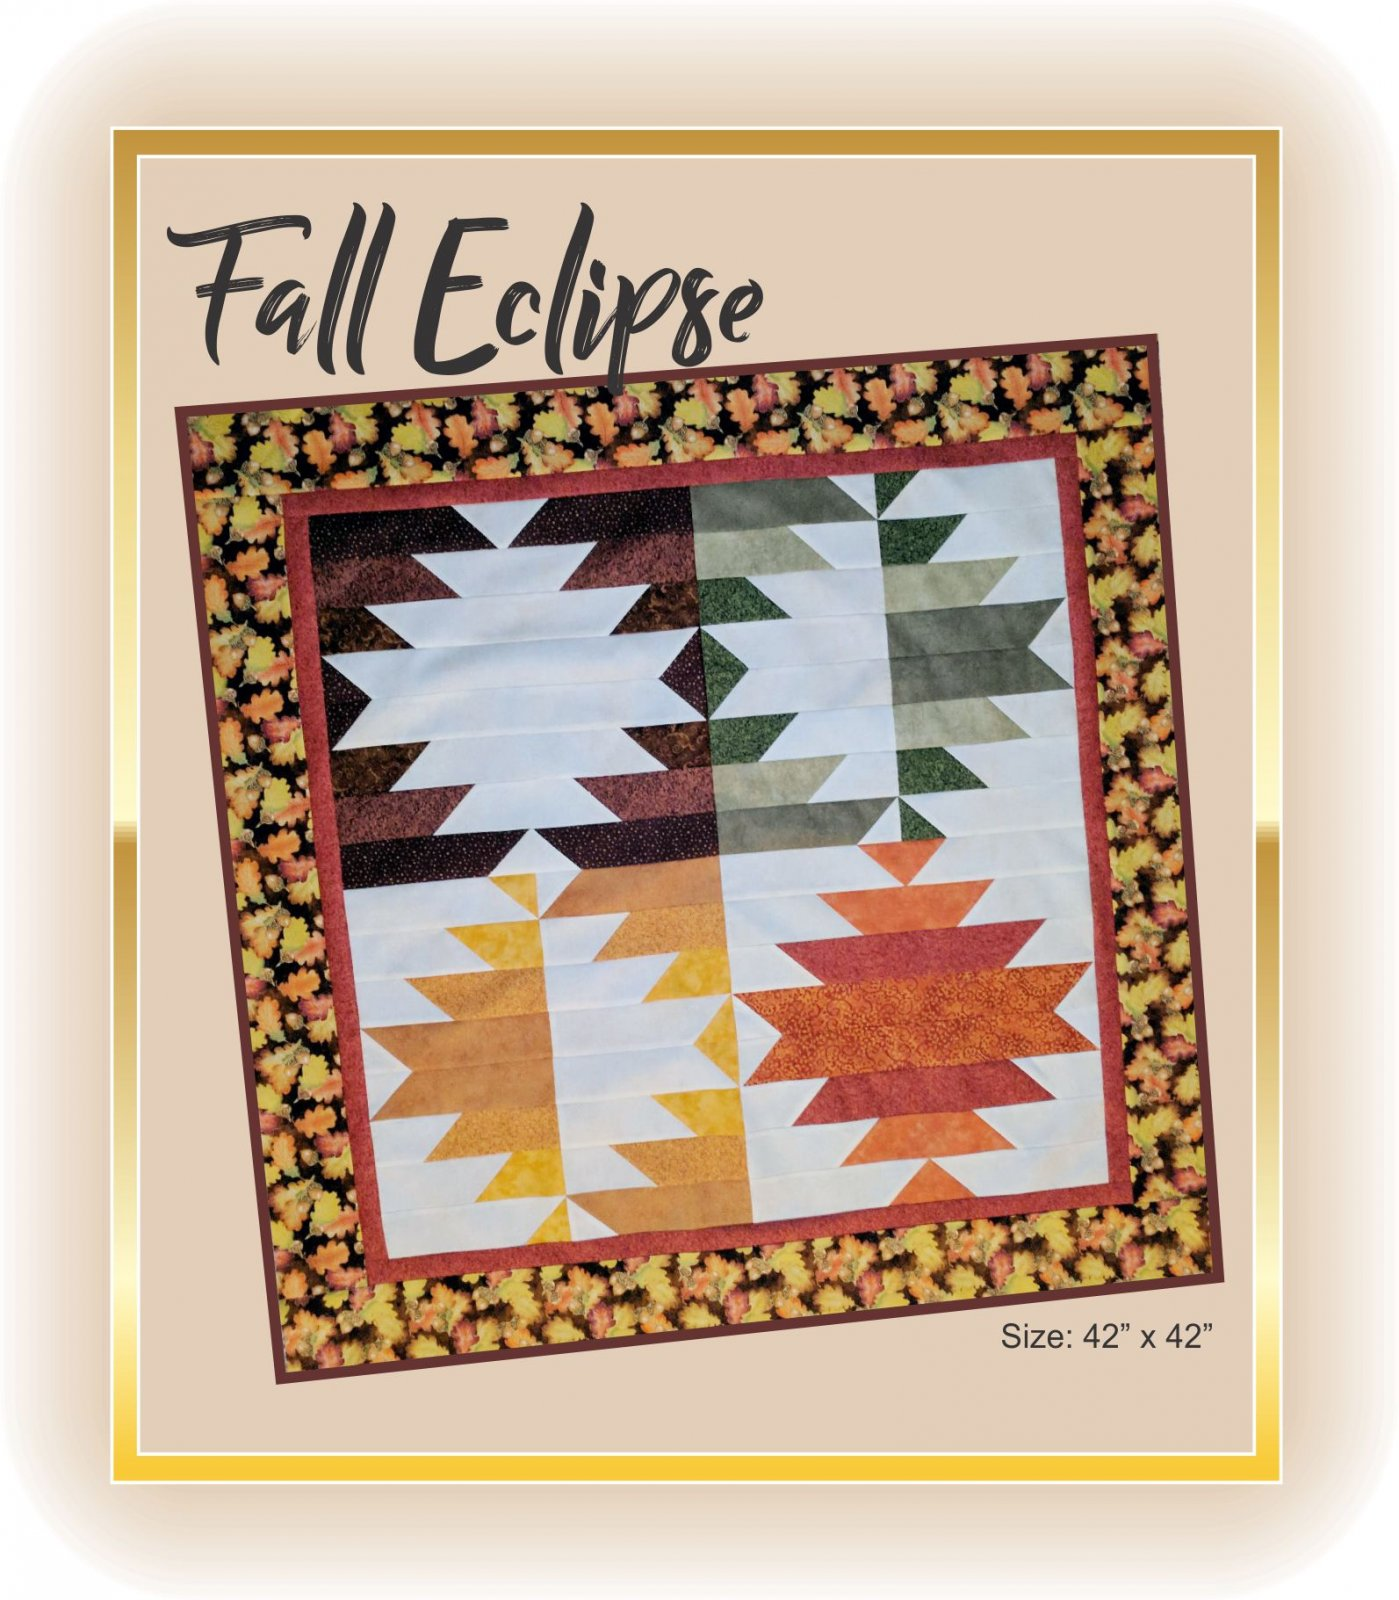 Fall Eclipse Kit